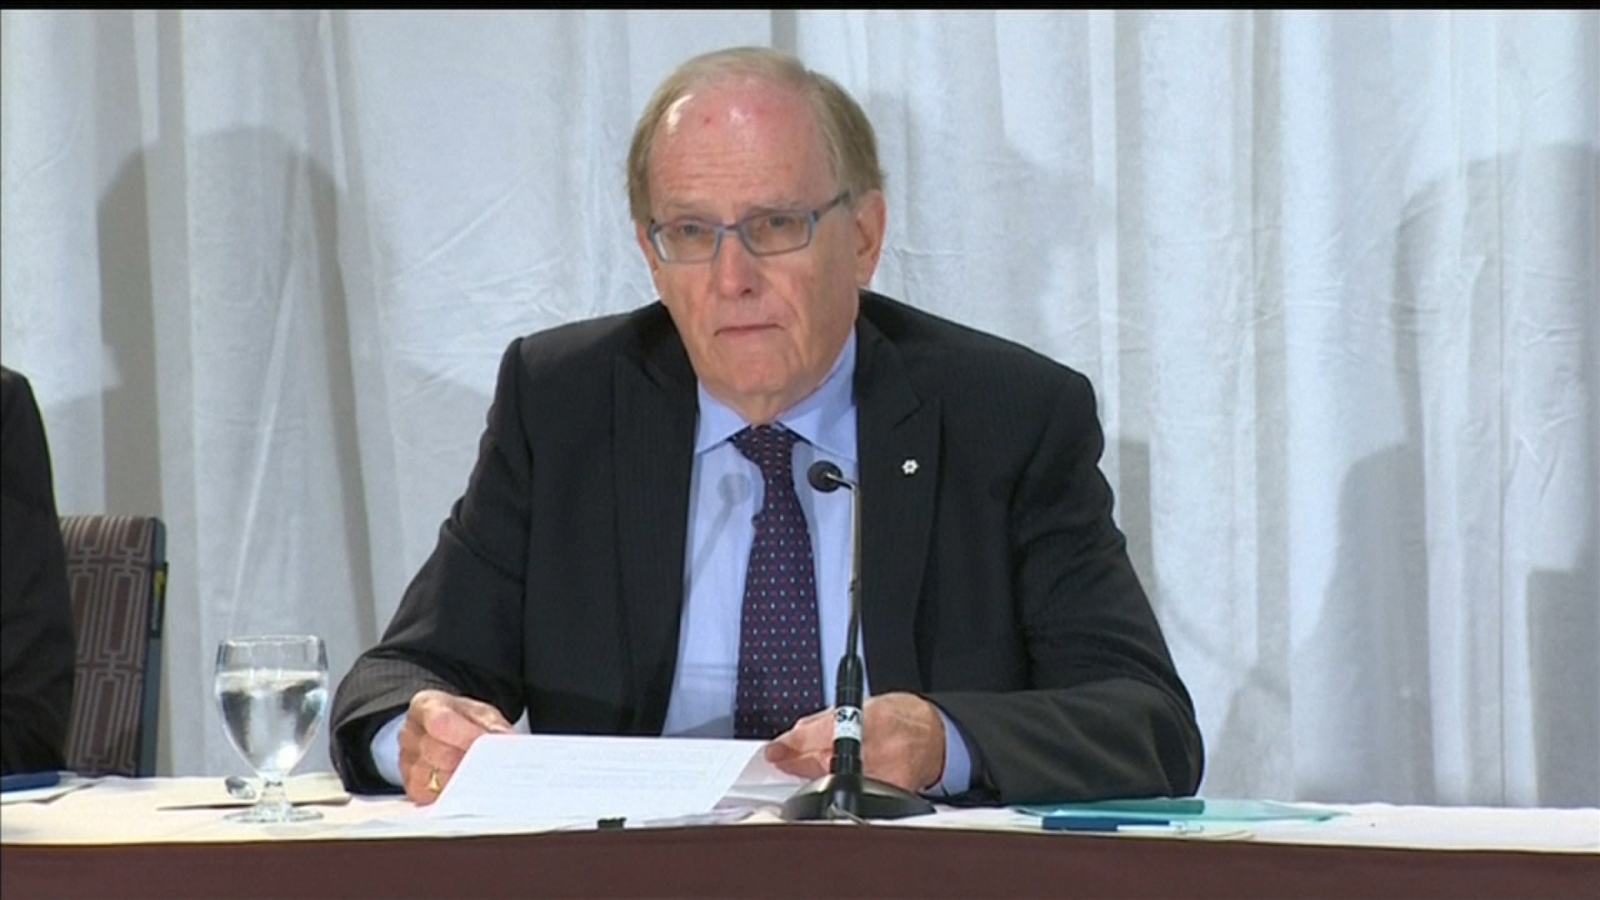 Dr. Richard McLaren